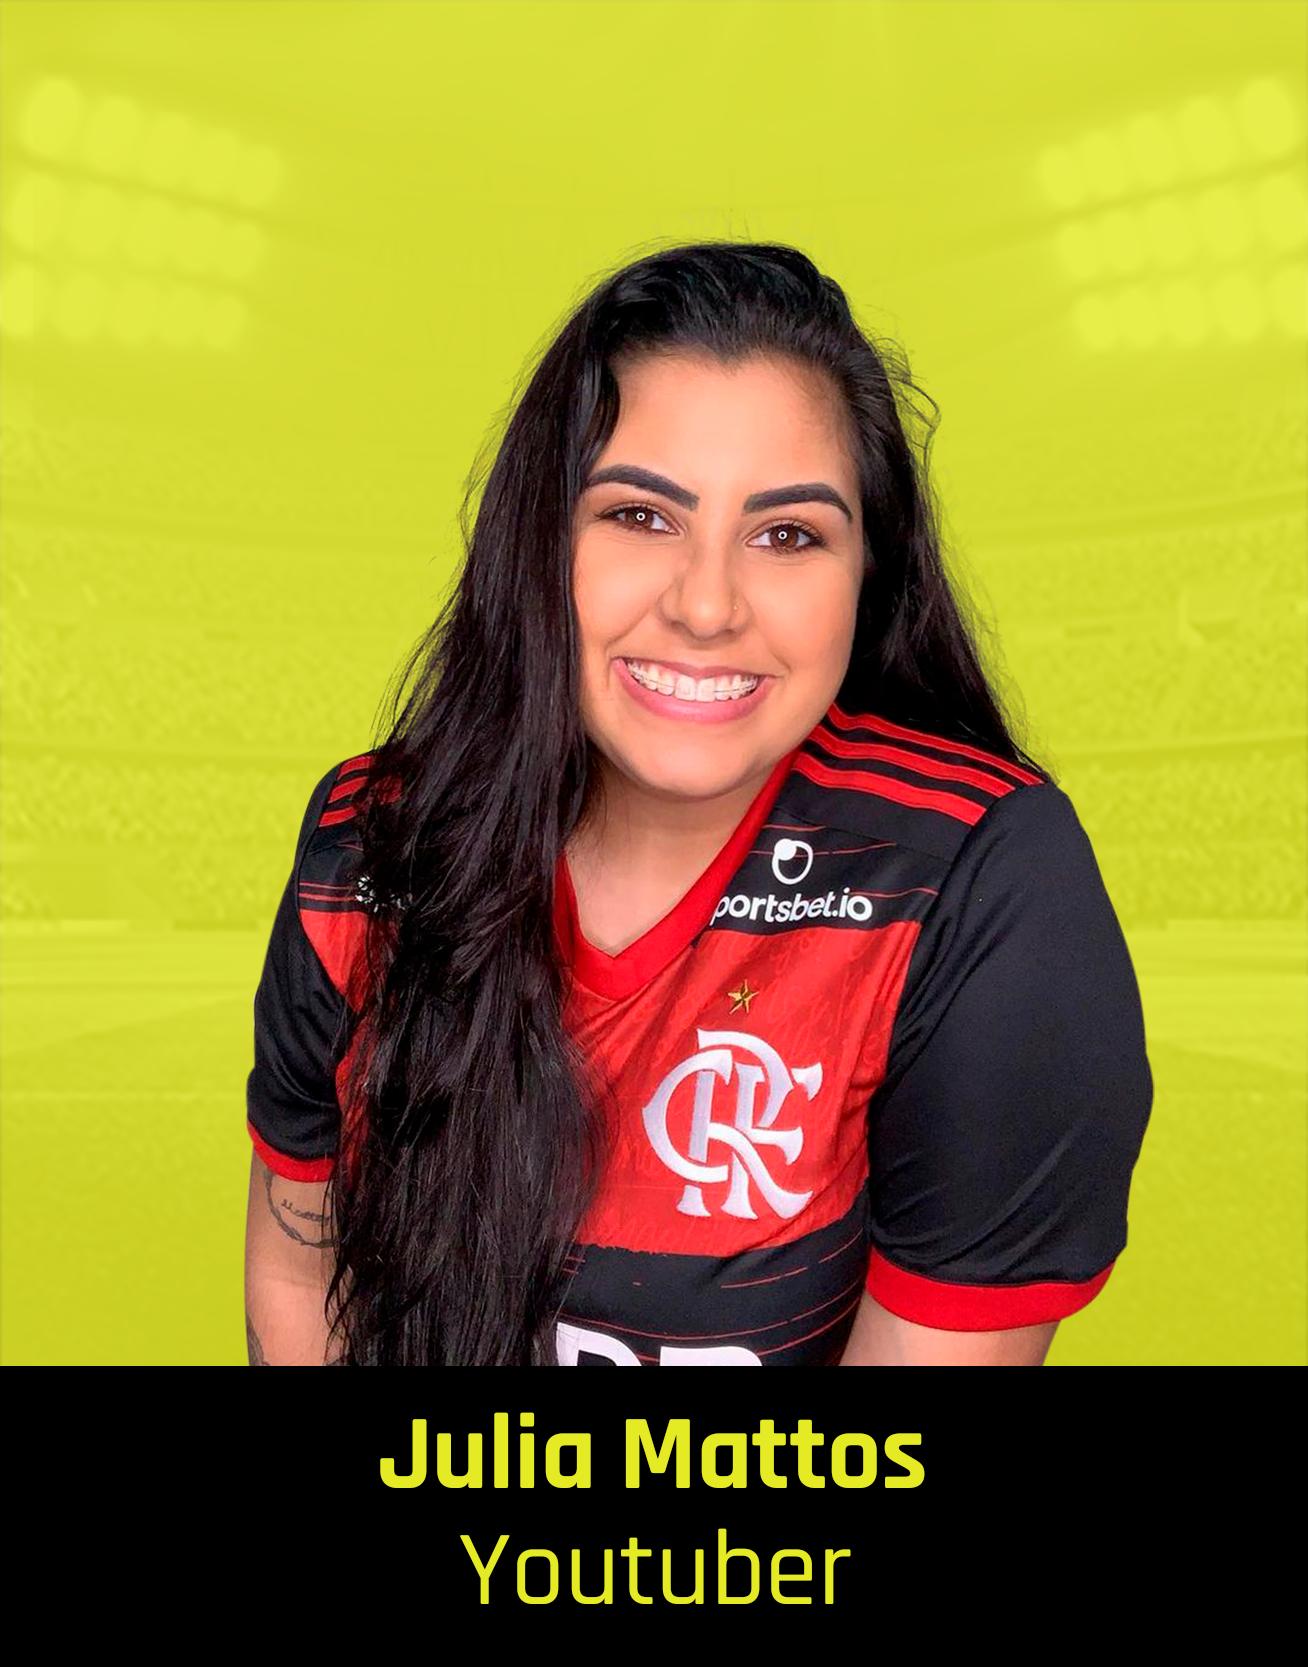 Julia Mattos